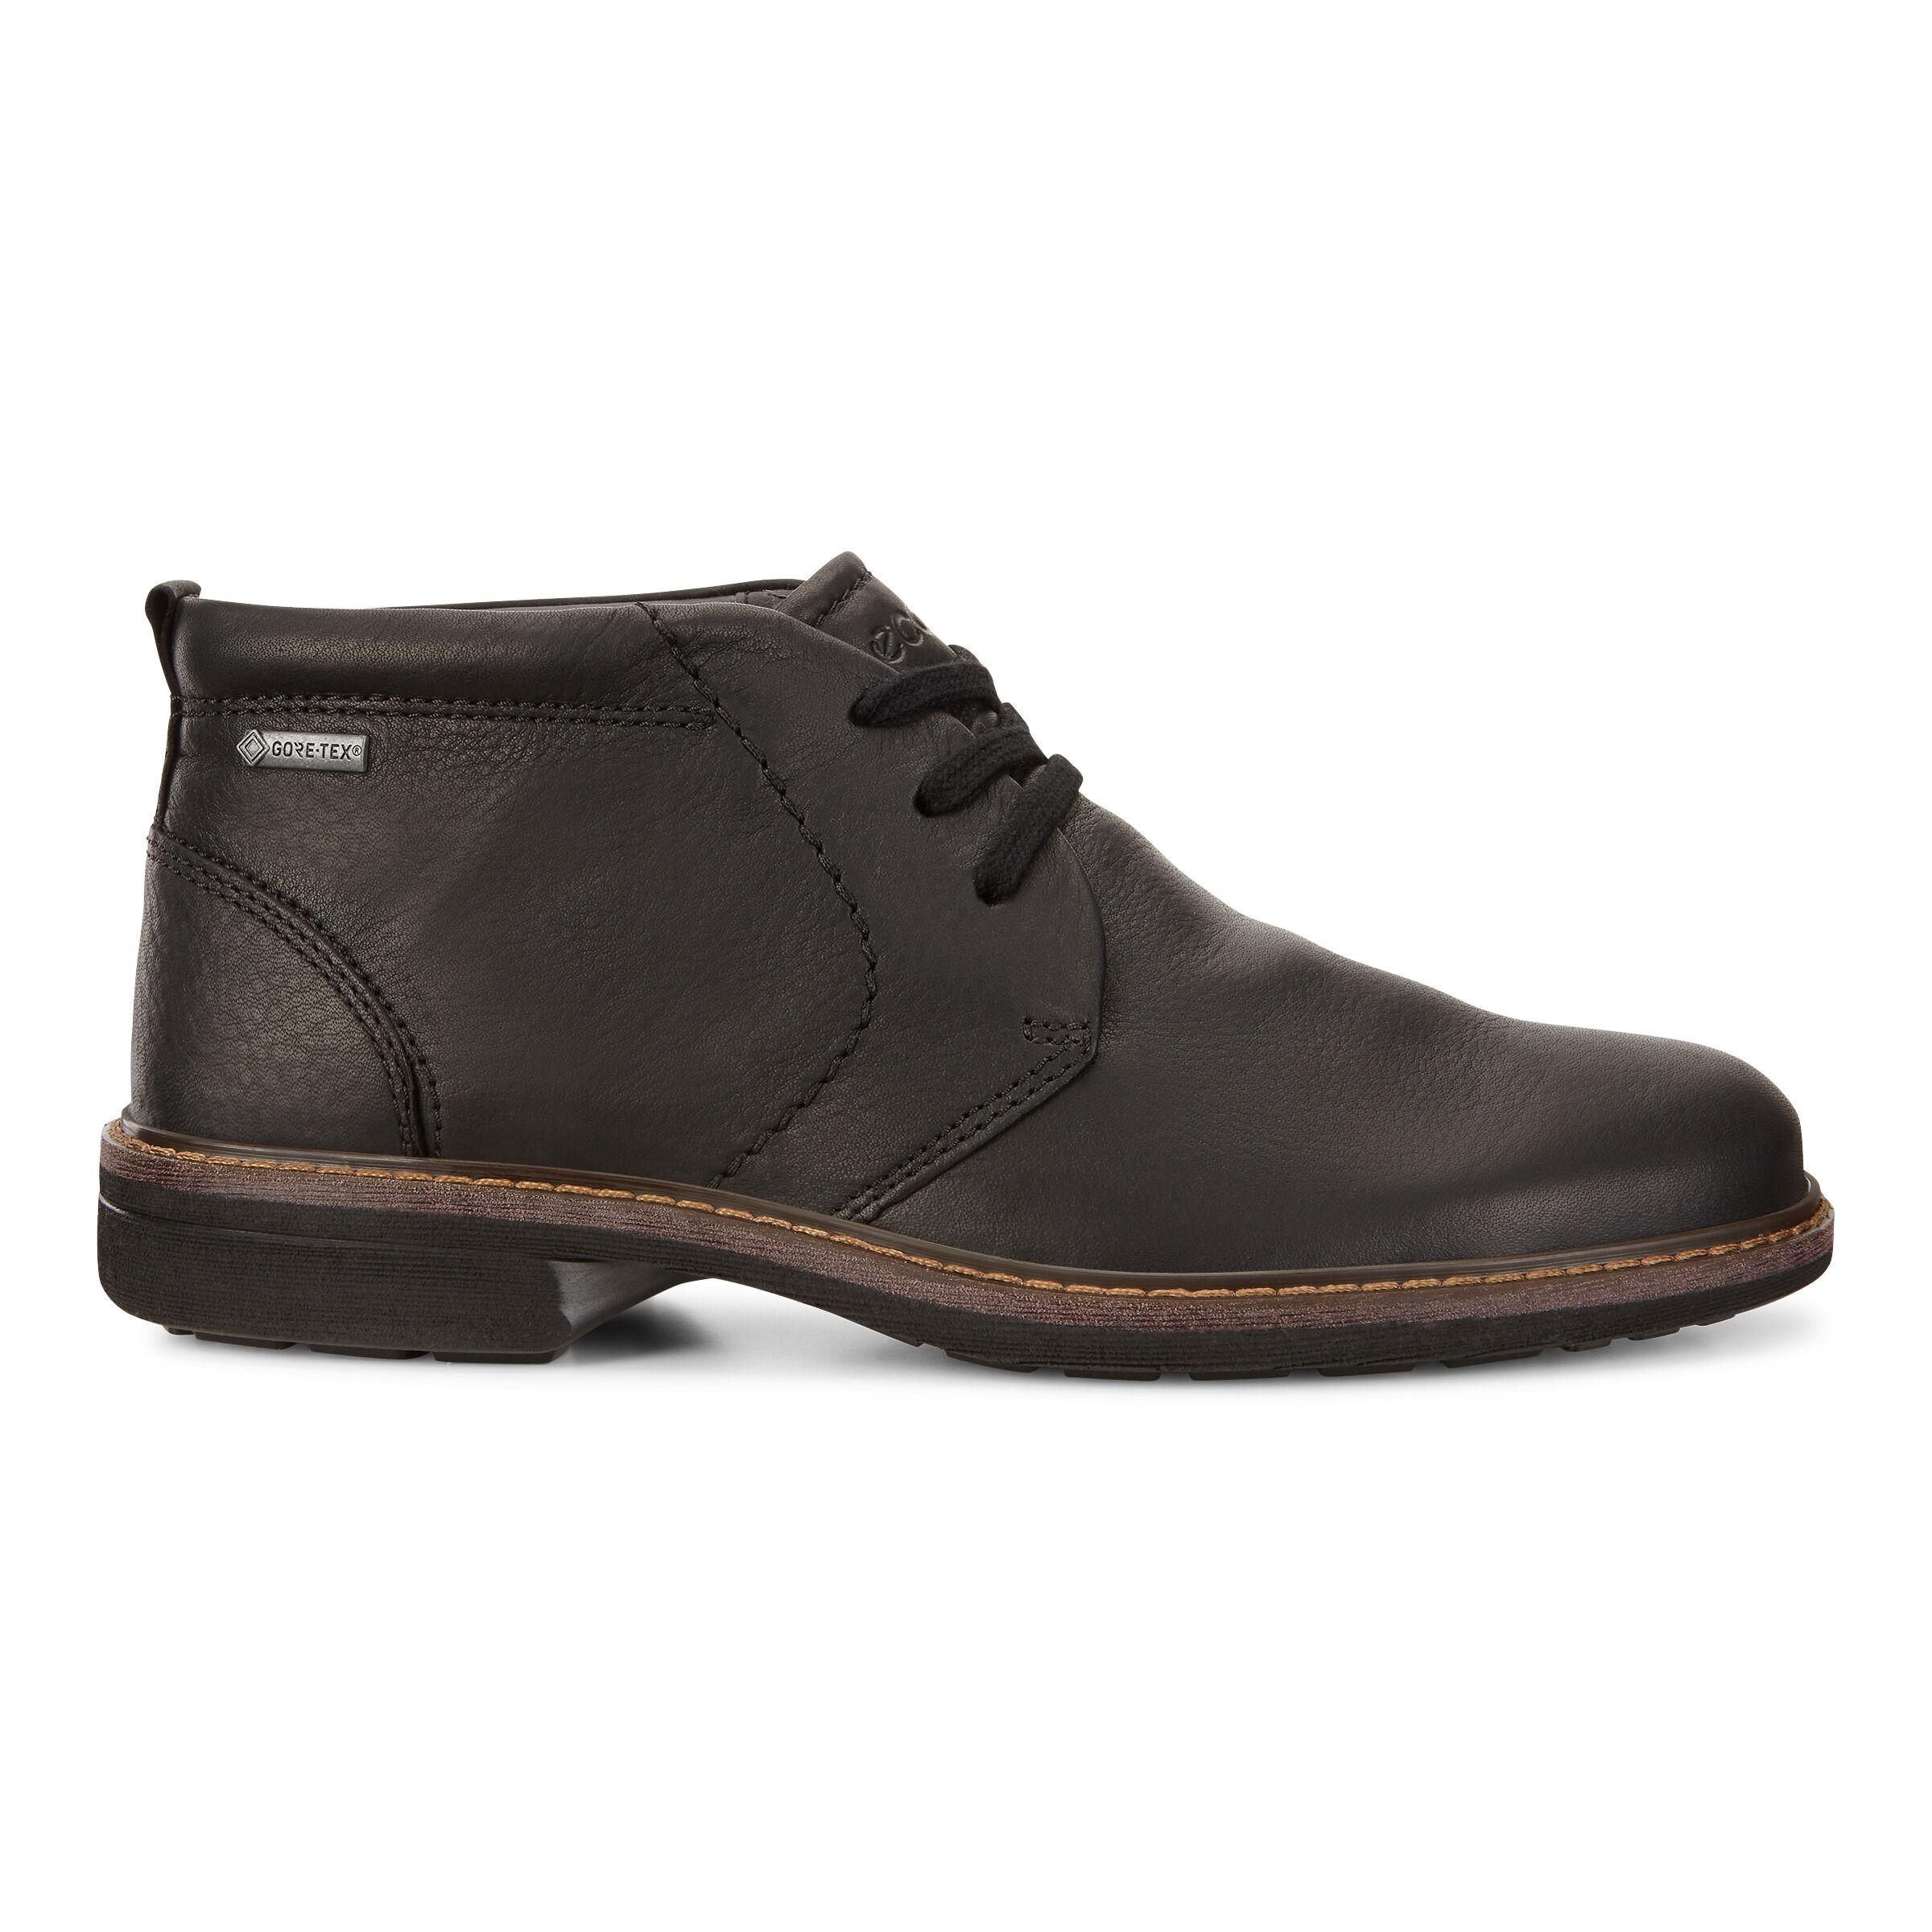 ECCO Turn GTX Chukka Tie | Men's Boots